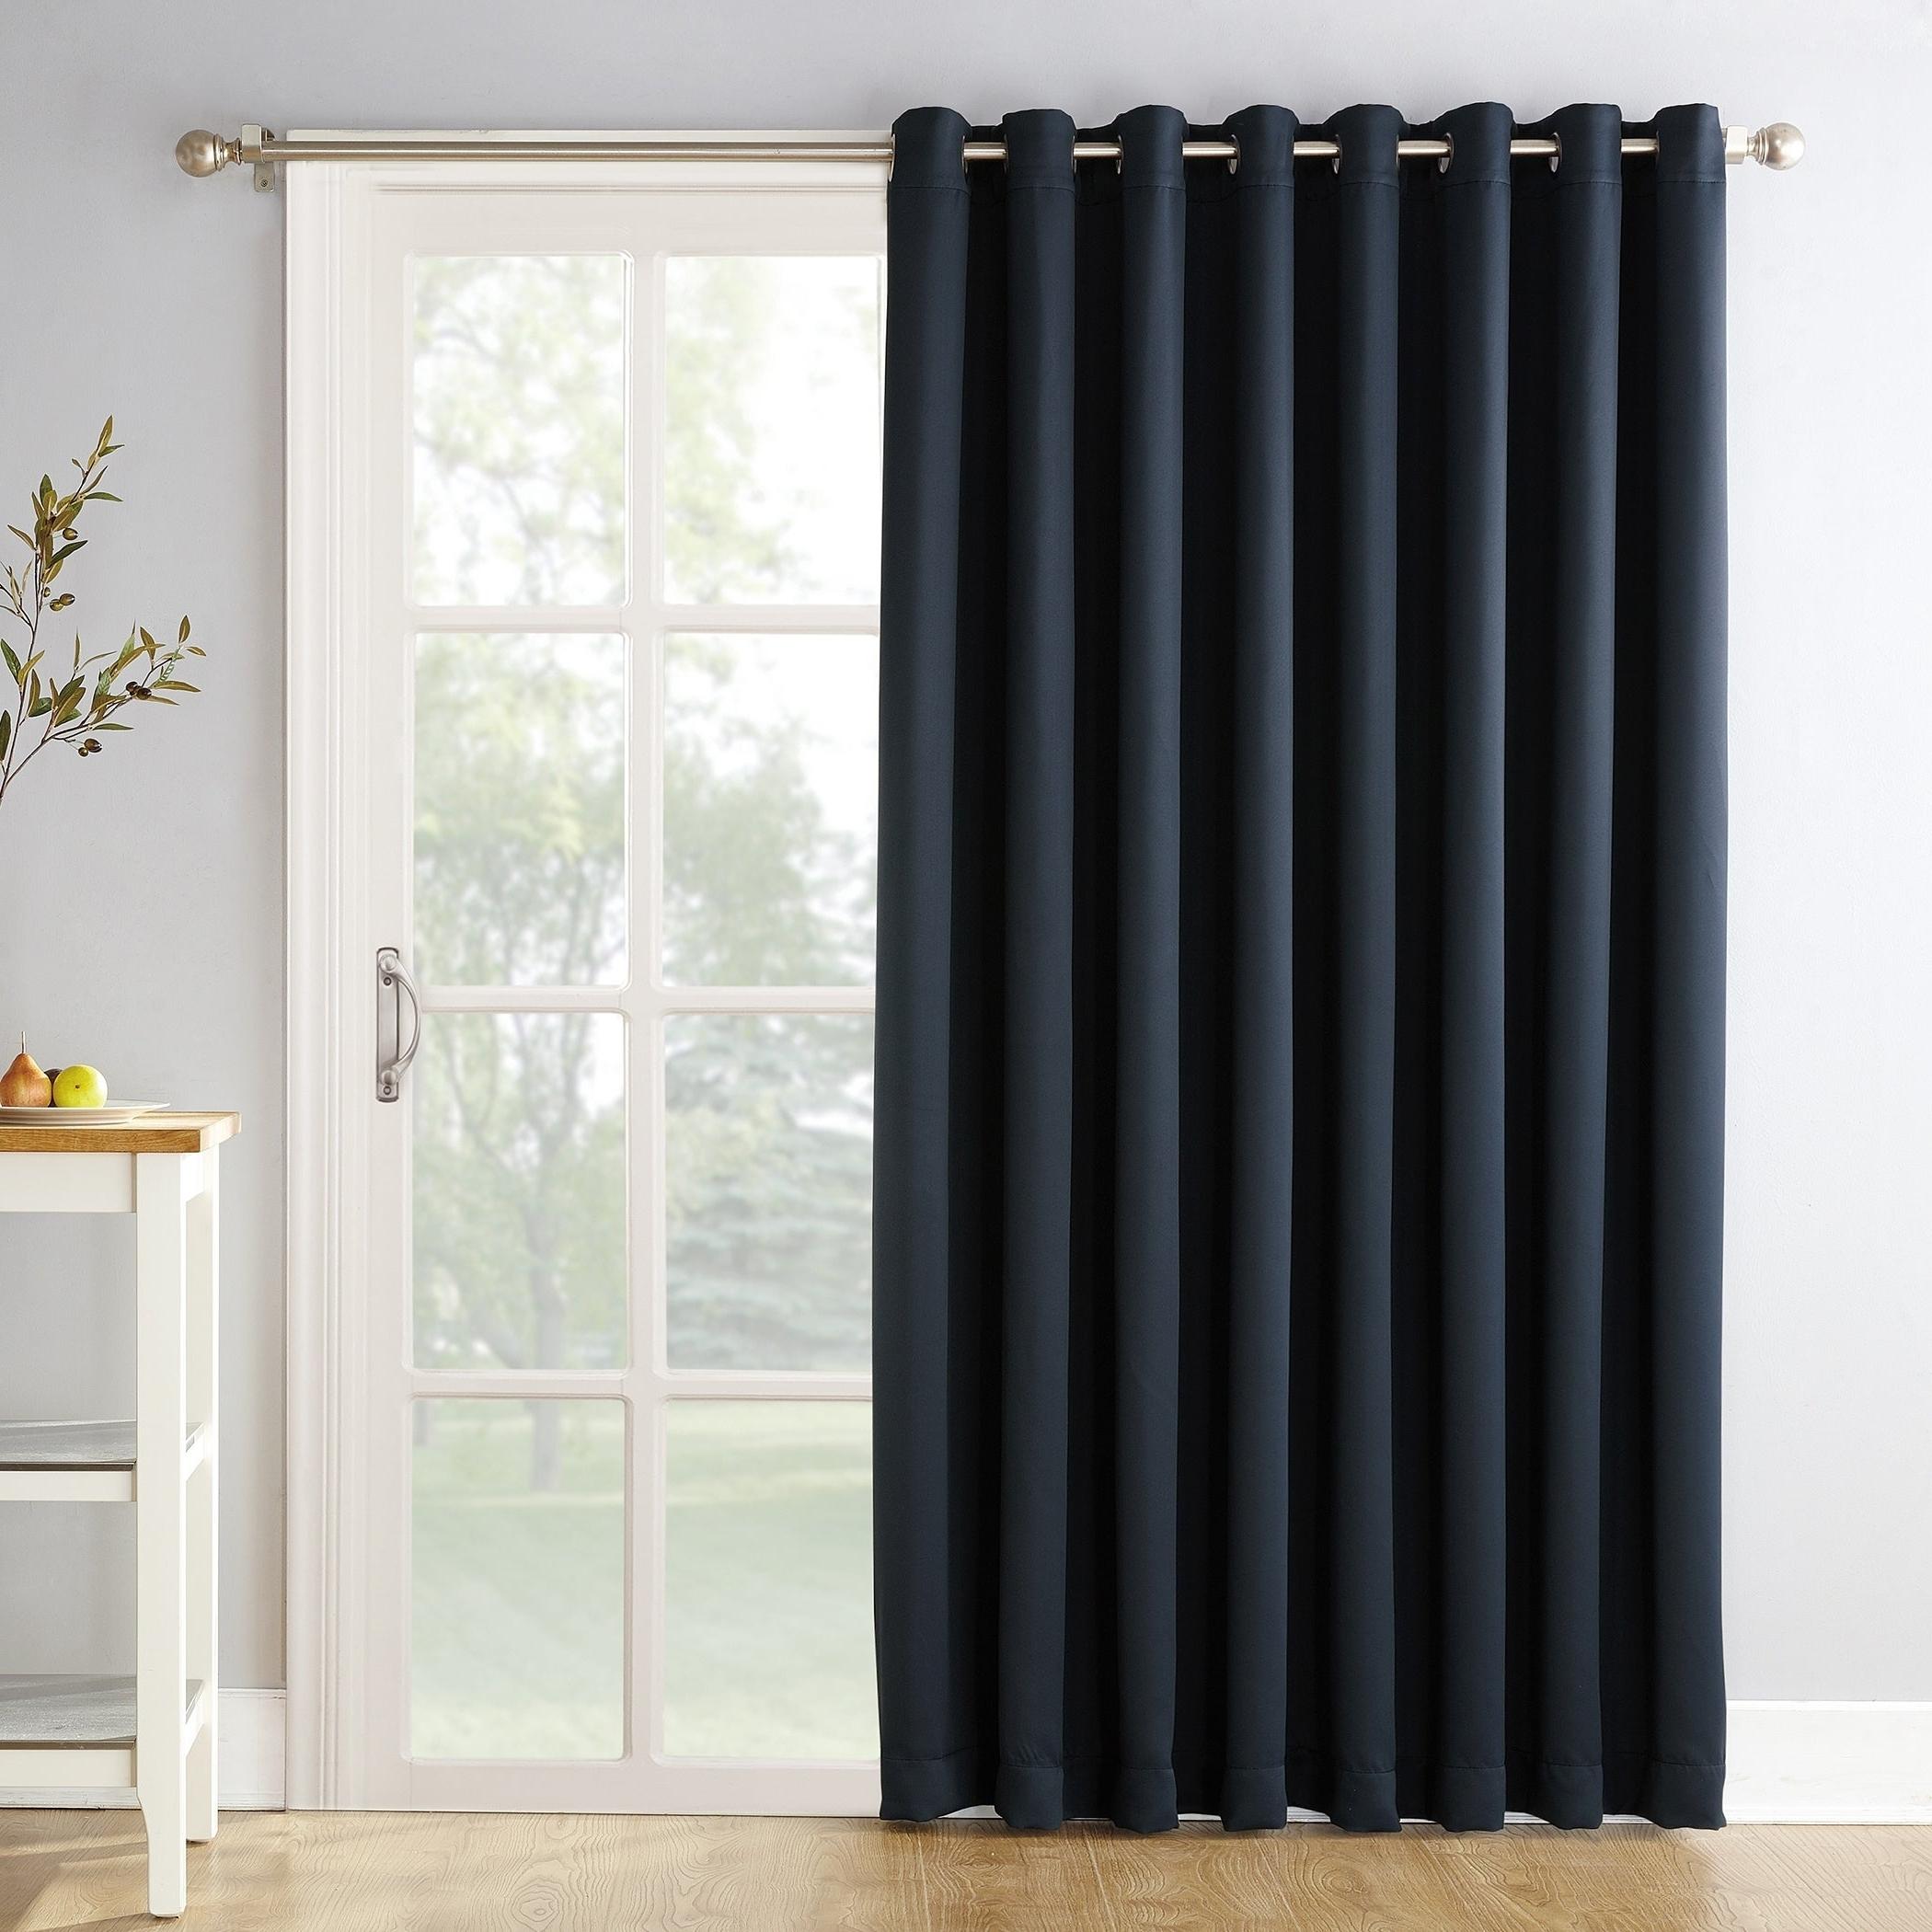 Best And Newest Details About Sun Zero Hayden Grommet Blackout Patio Door Window Curtain With Hayden Grommet Blackout Single Curtain Panels (View 5 of 20)